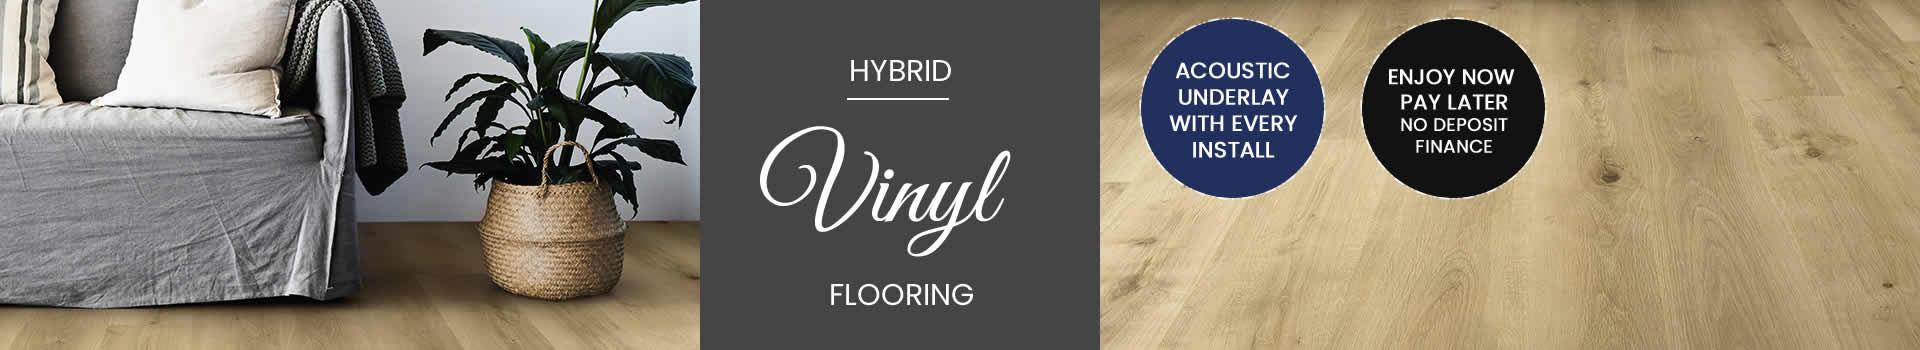 Melbourne Hybrid vinyl planks